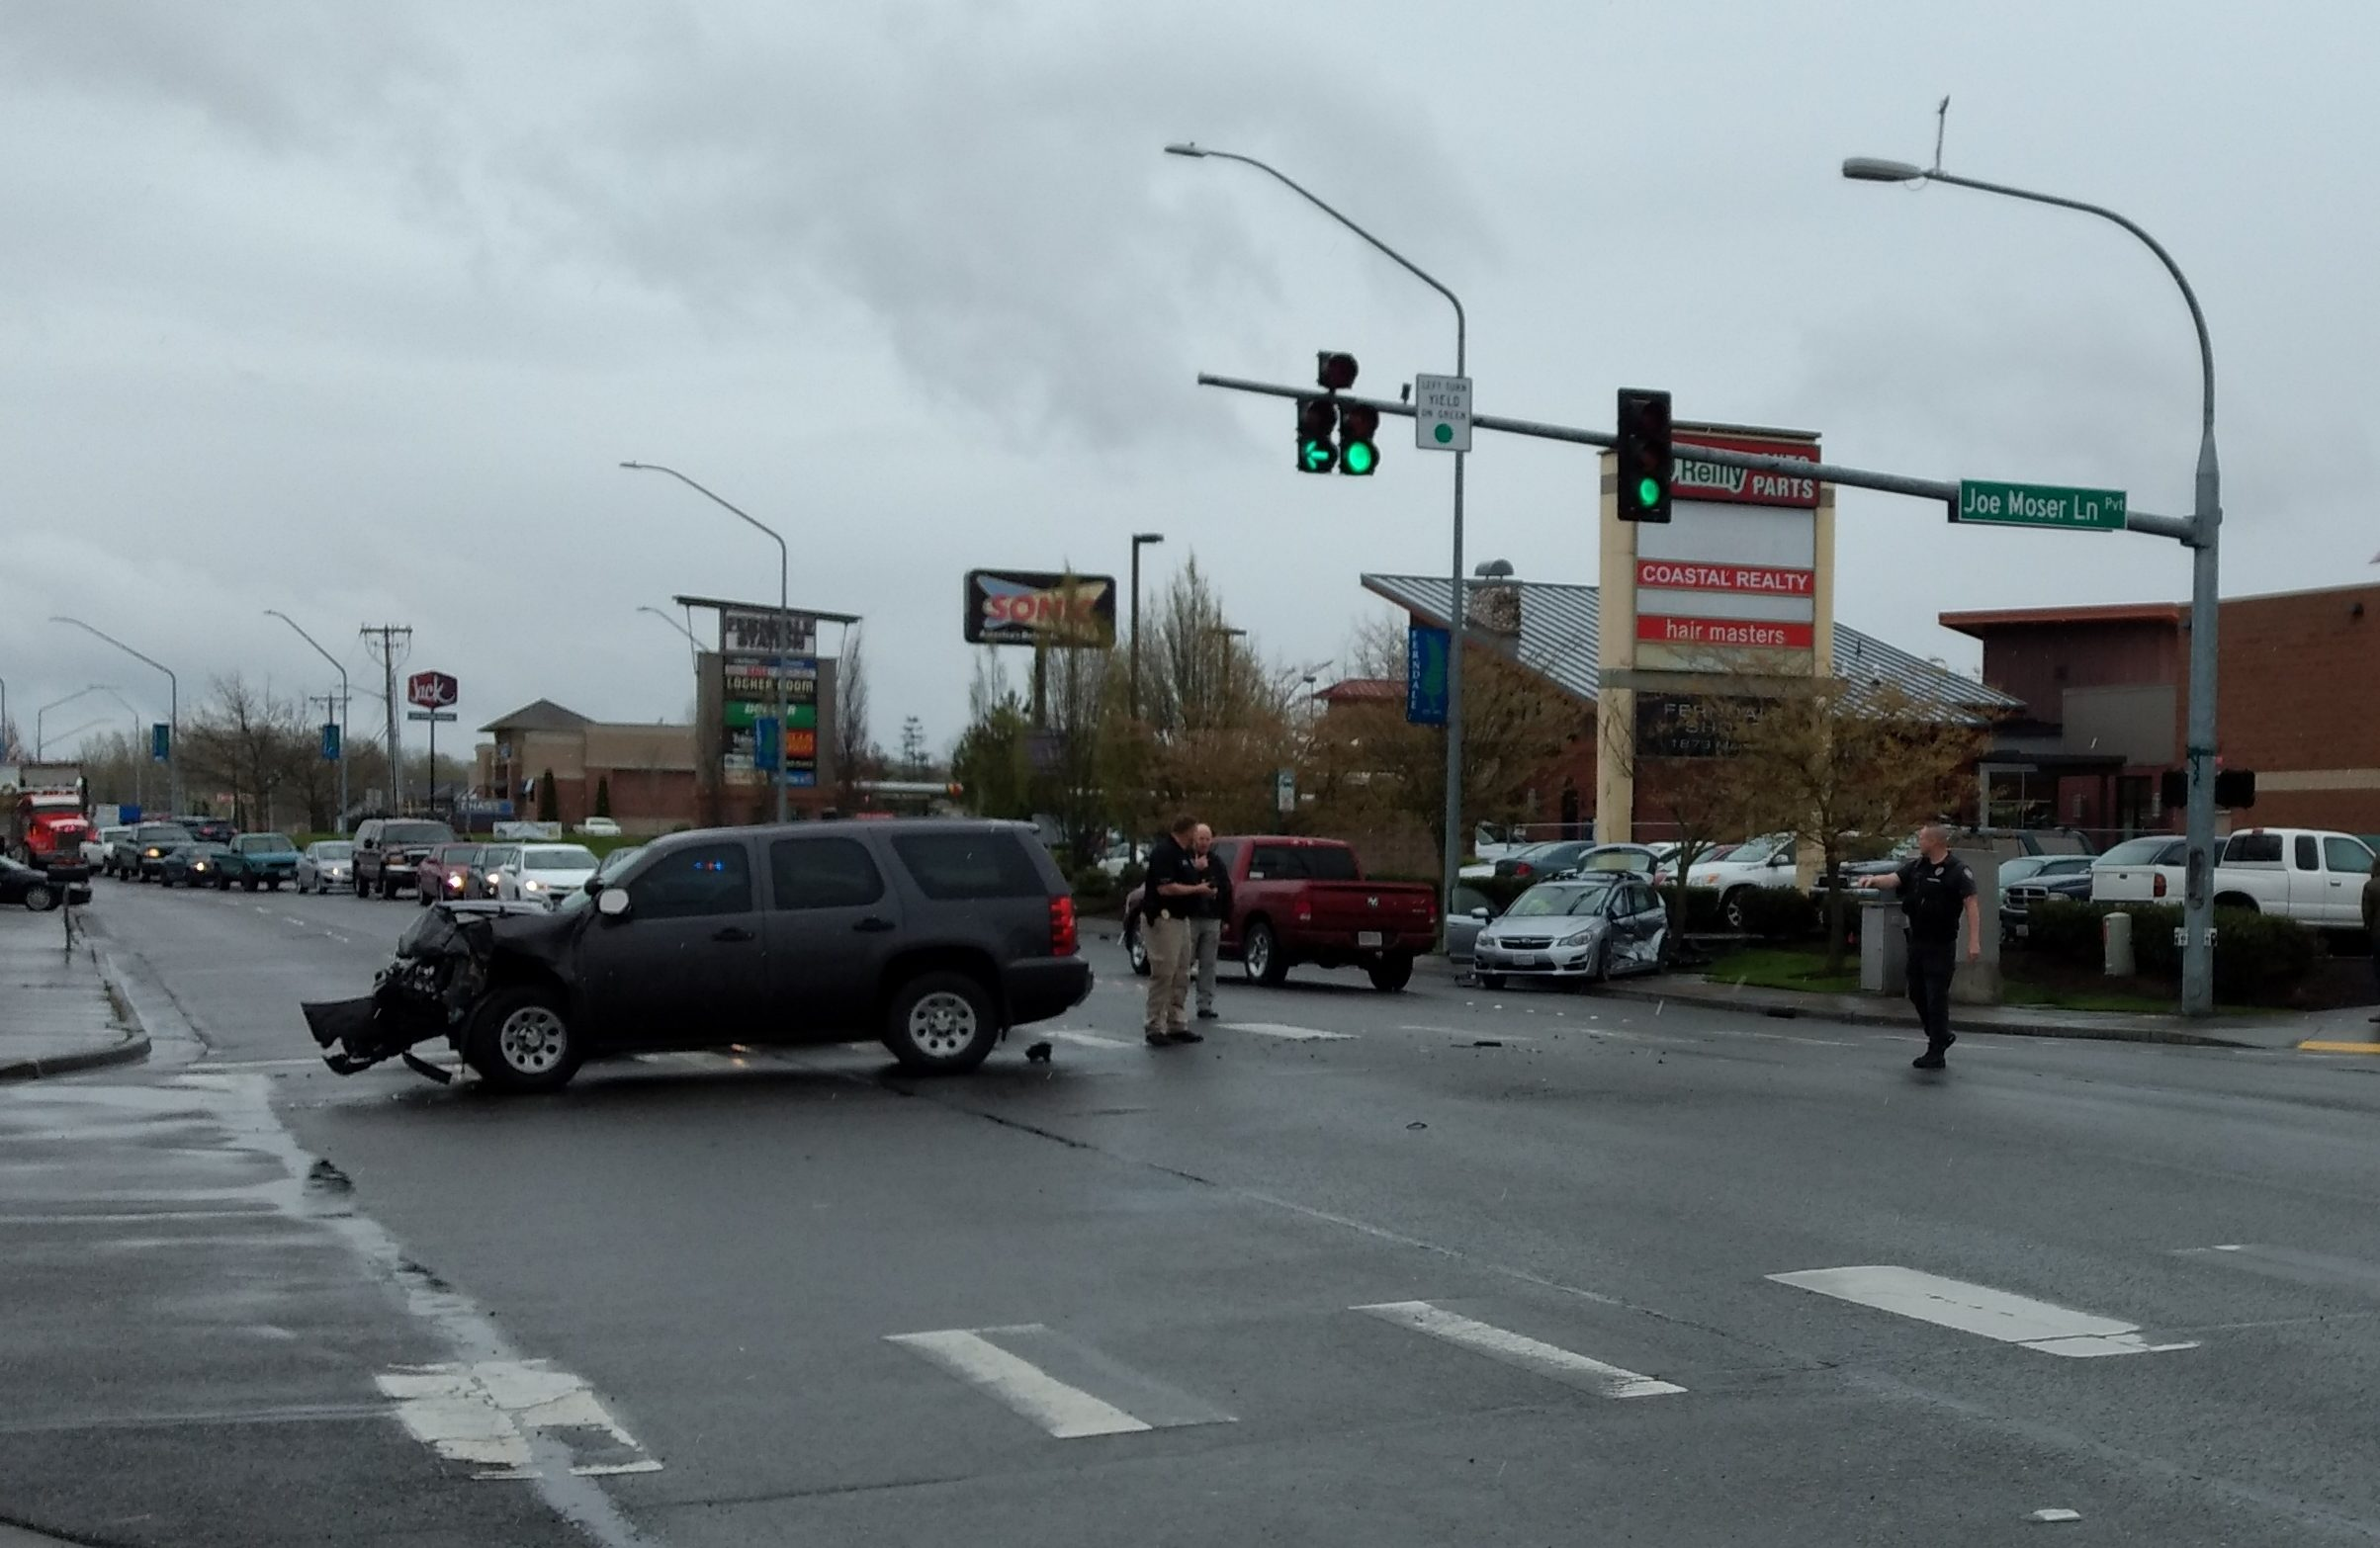 Scene of an officer-involved crash on Main Street (April 11, 2019). Photo: My Ferndale News